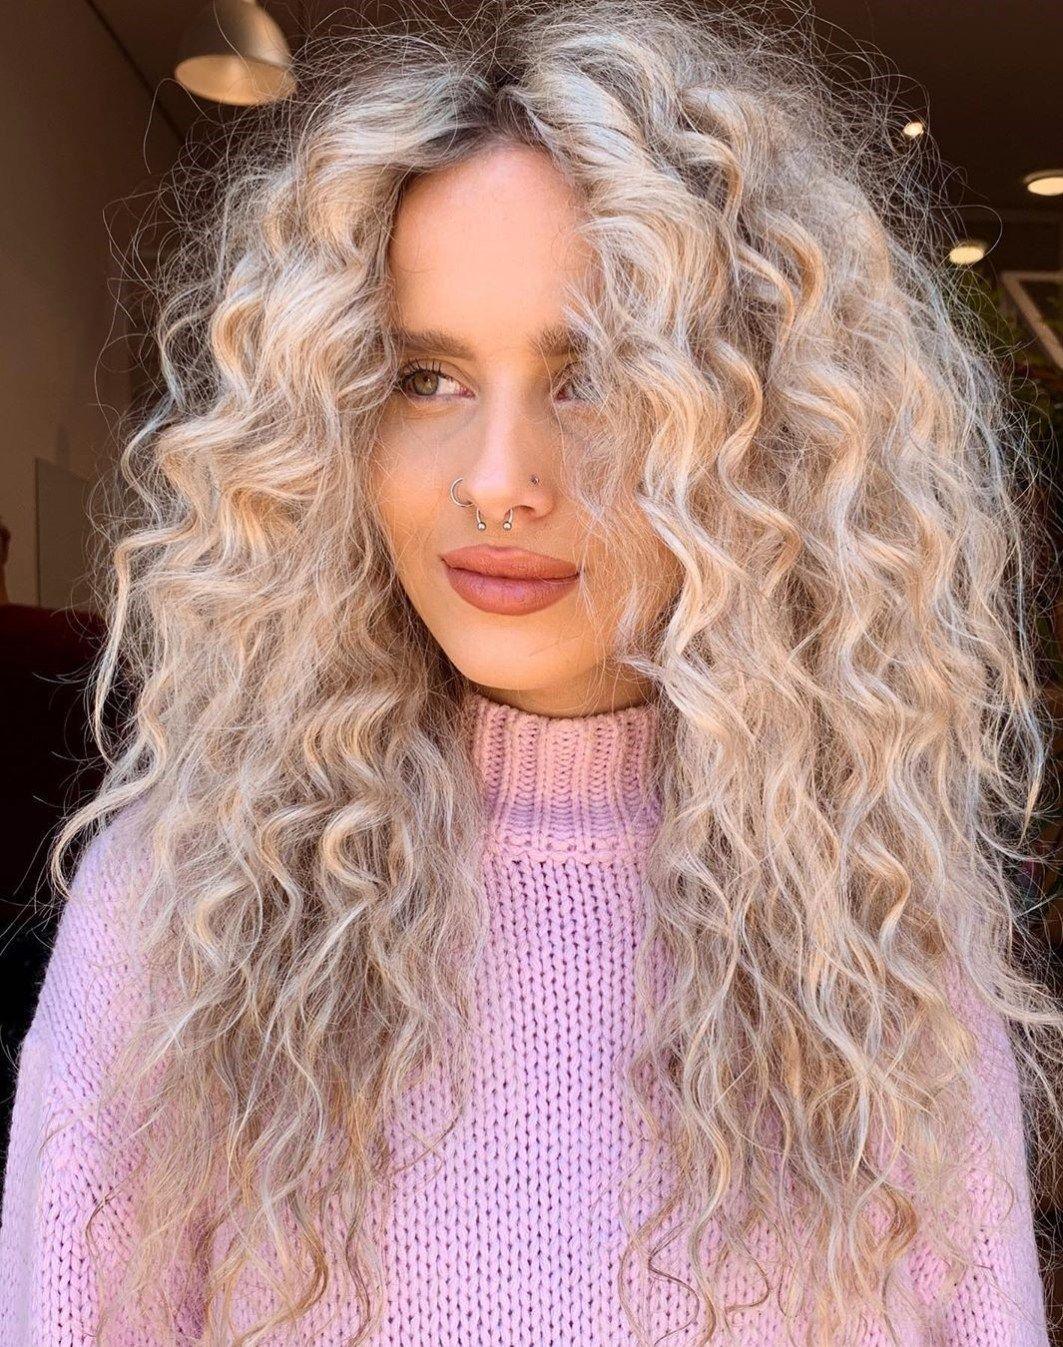 40 Bombshell Silver Hair Color Ideas For 2020 Hair Adviser In 2020 Silver Blonde Hair Silver Ombre Hair Curly Hair Styles